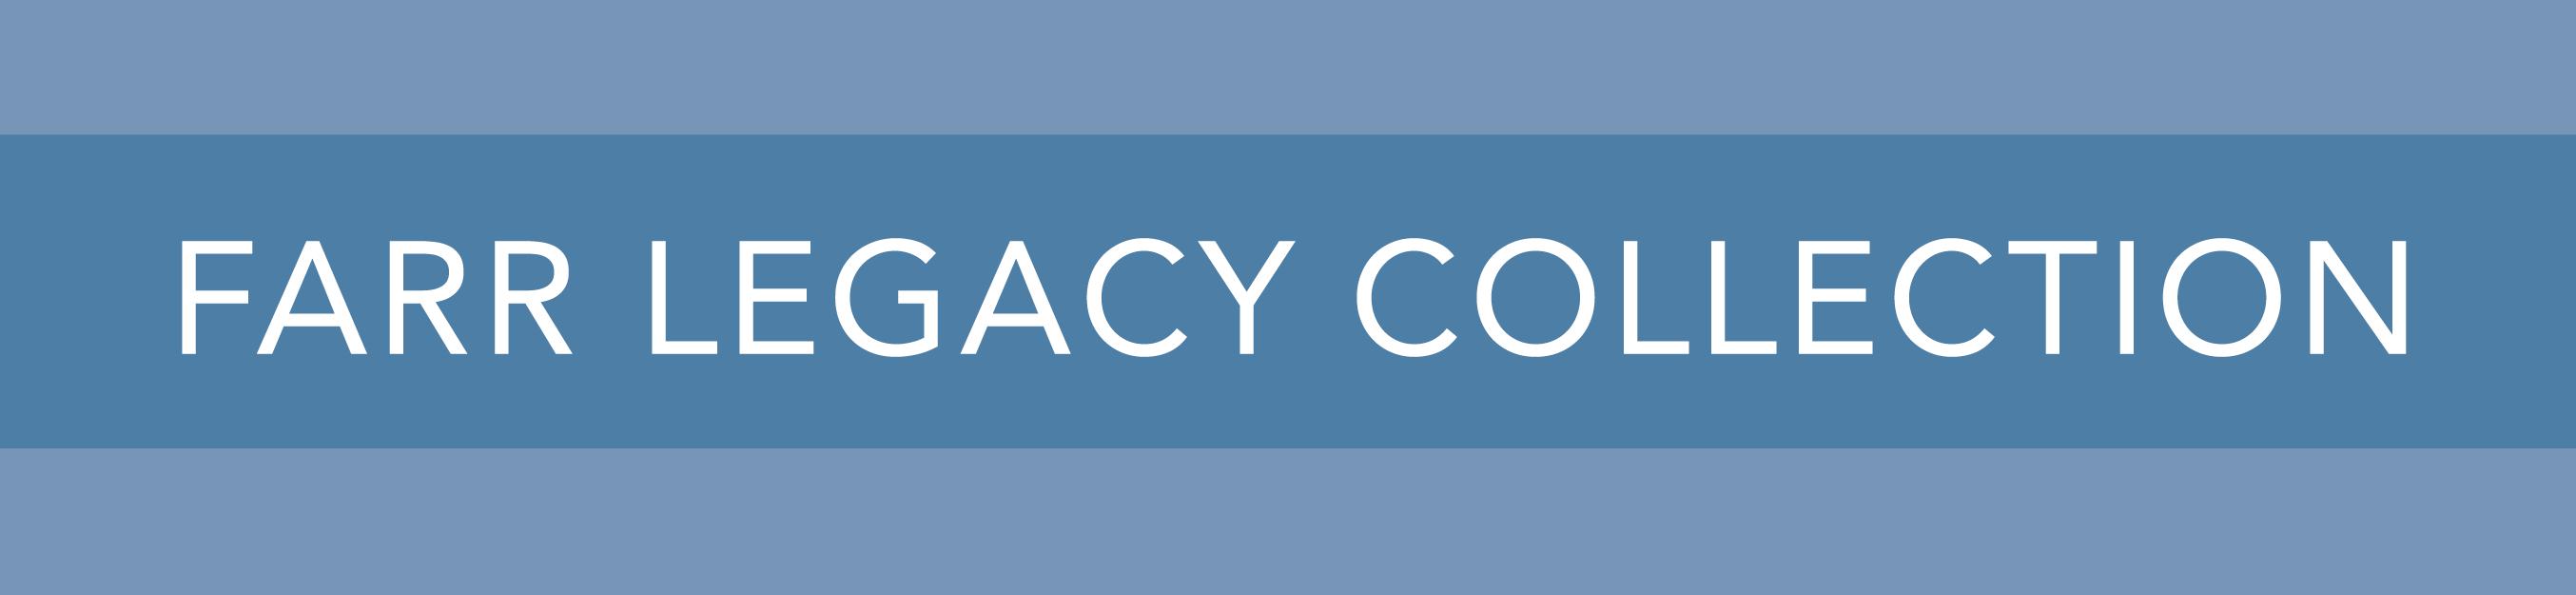 Farr Legacy Collection Header